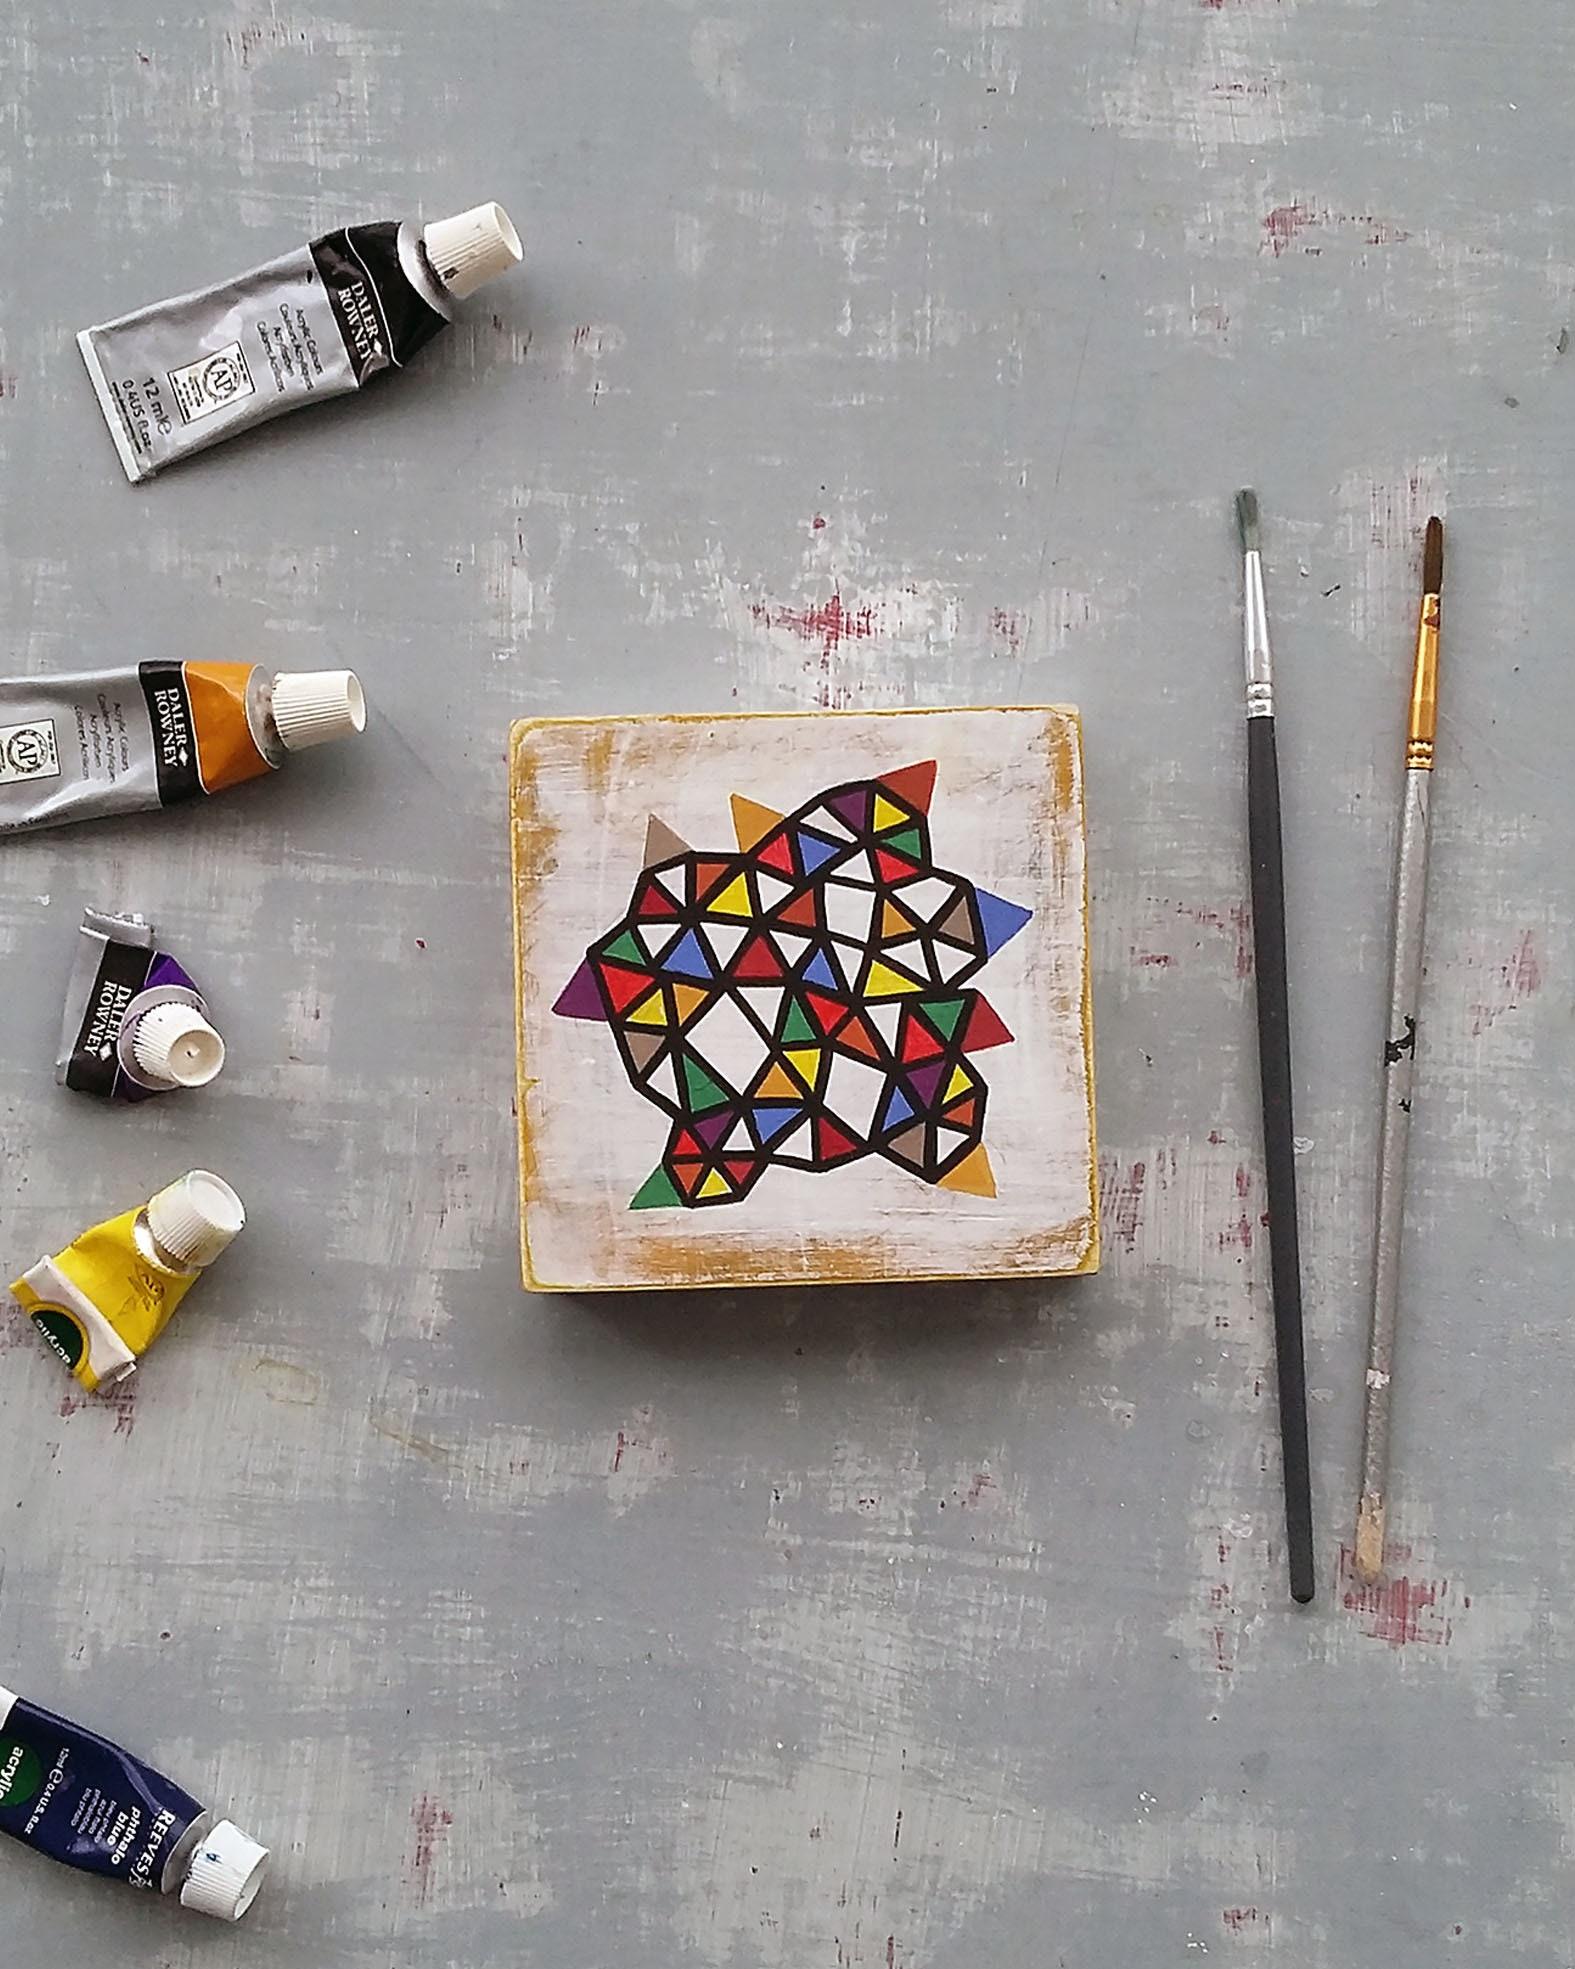 Slice_001, contemporary geometric art painting - product image